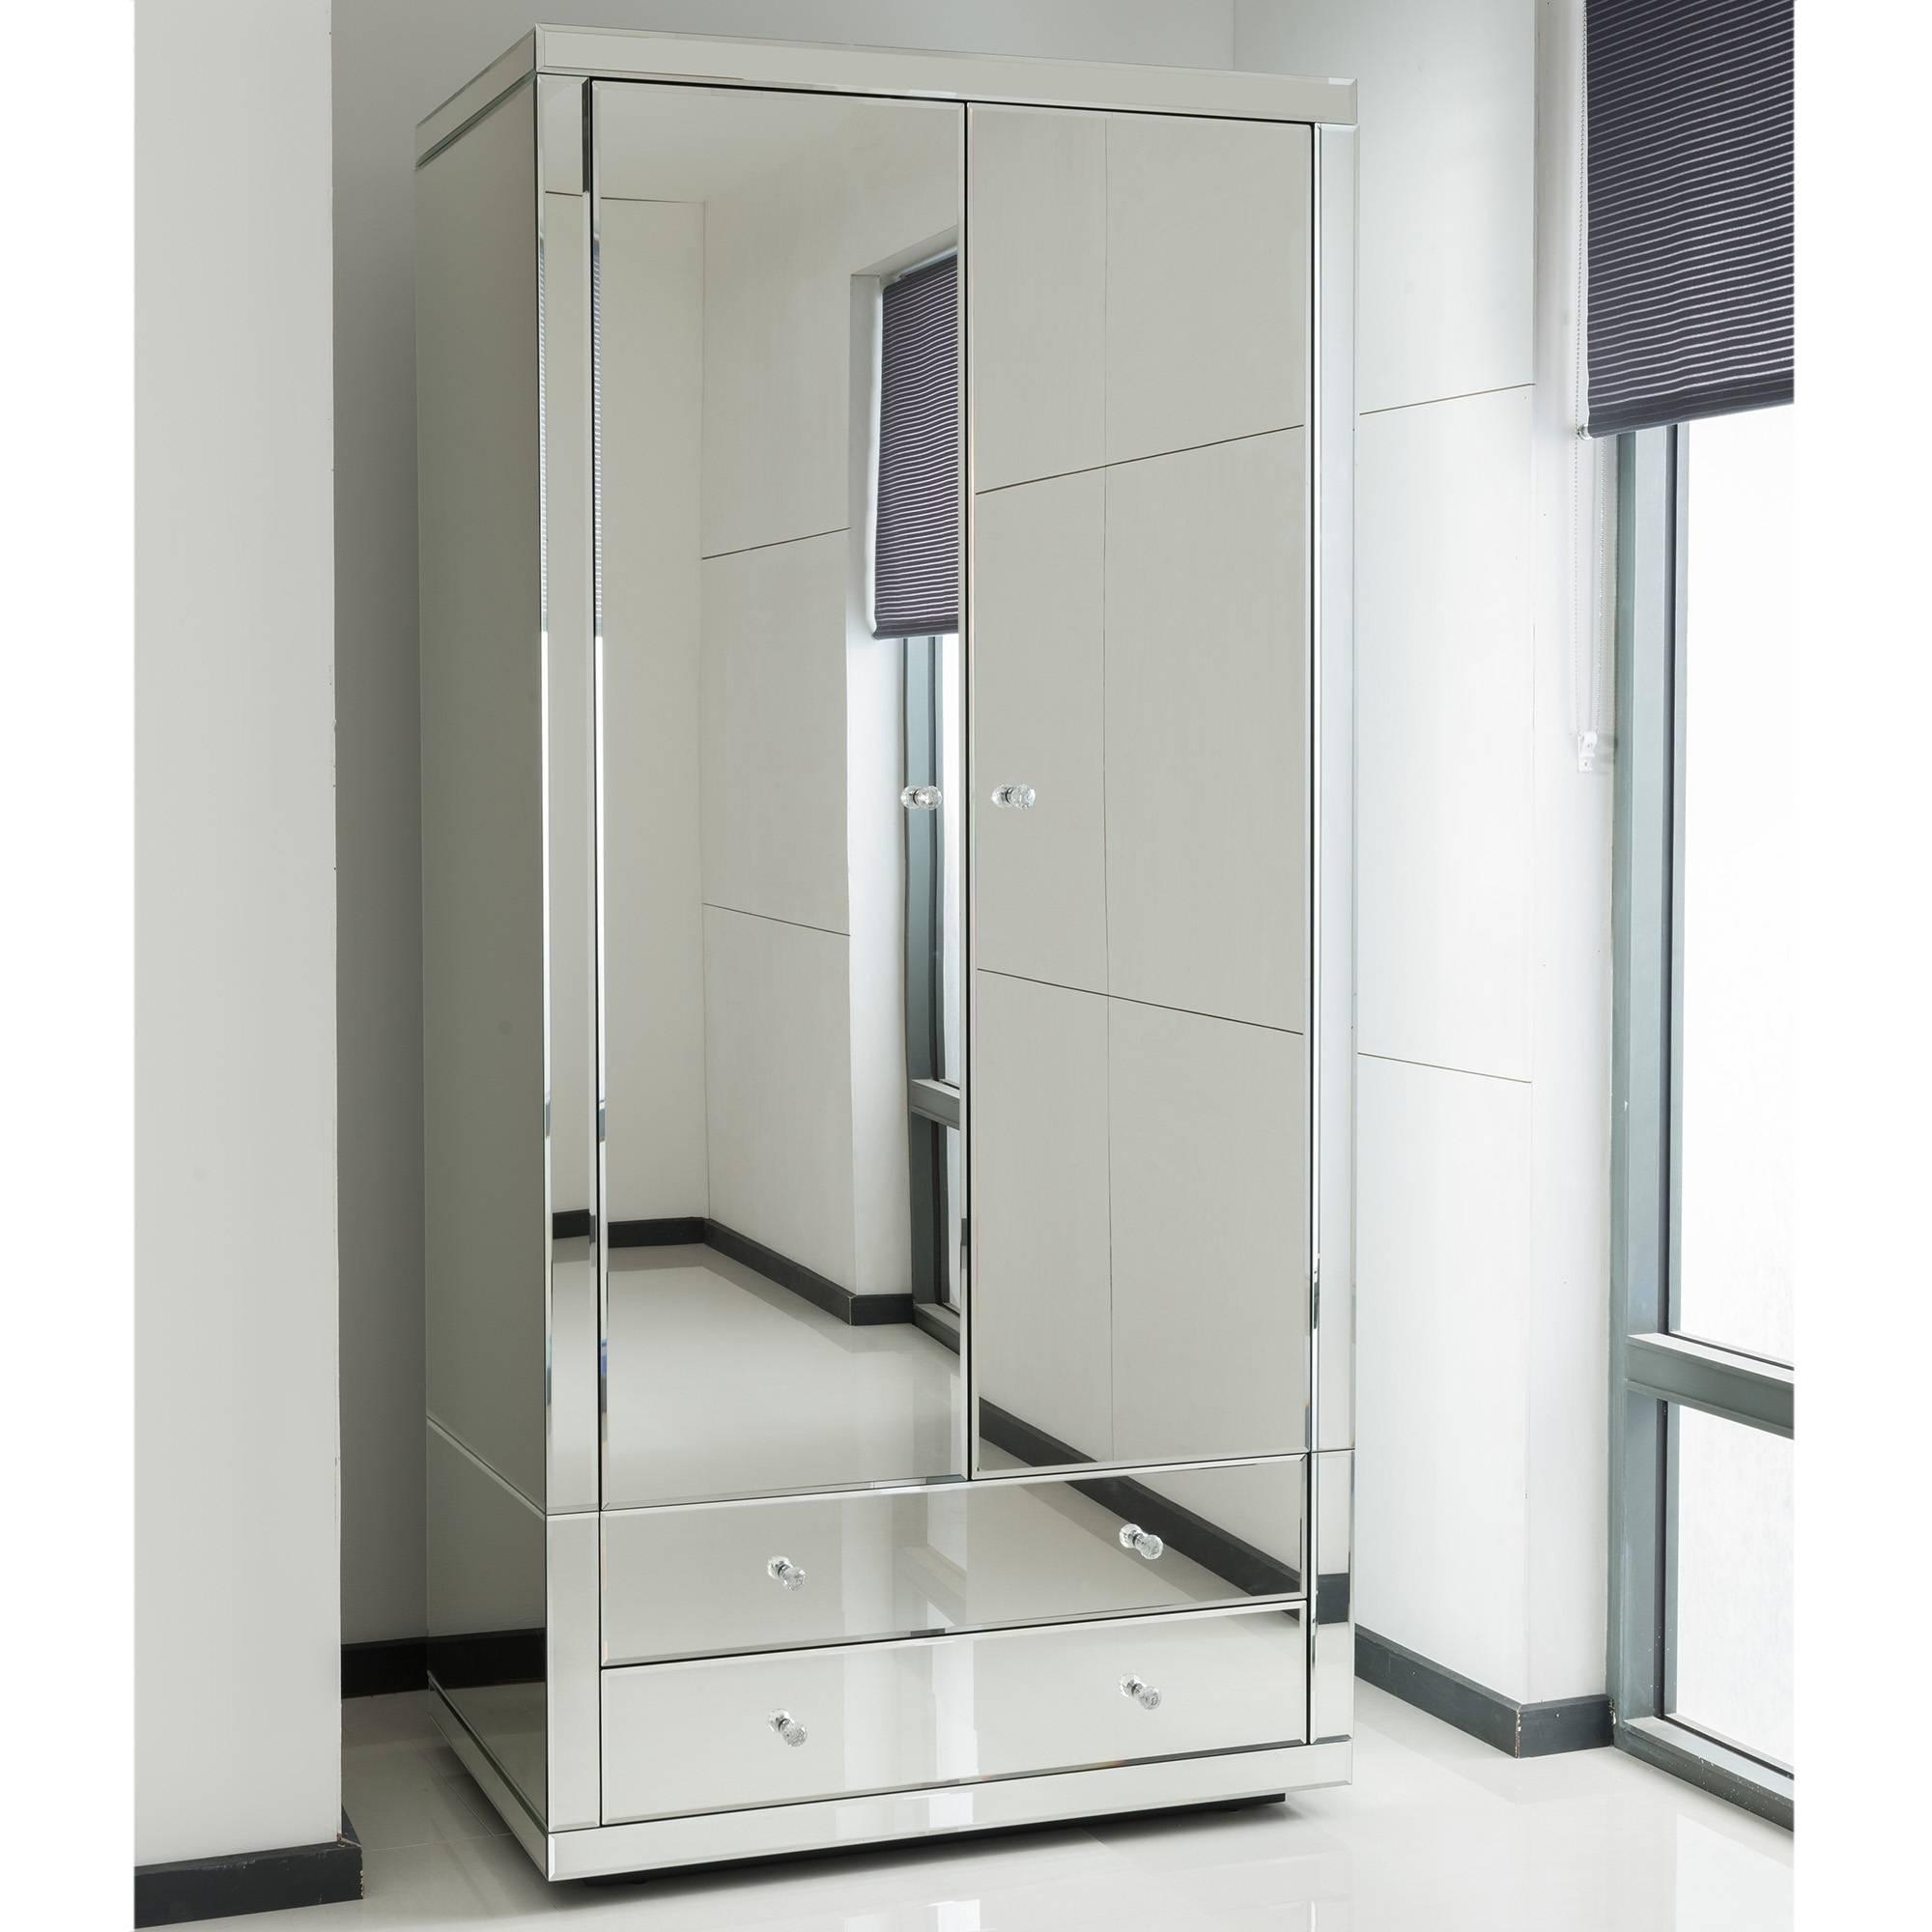 Romano Crystal Mirrored Wardrobe| Venetian Mirrored Furniture in Mirror Wardrobes (Image 10 of 15)